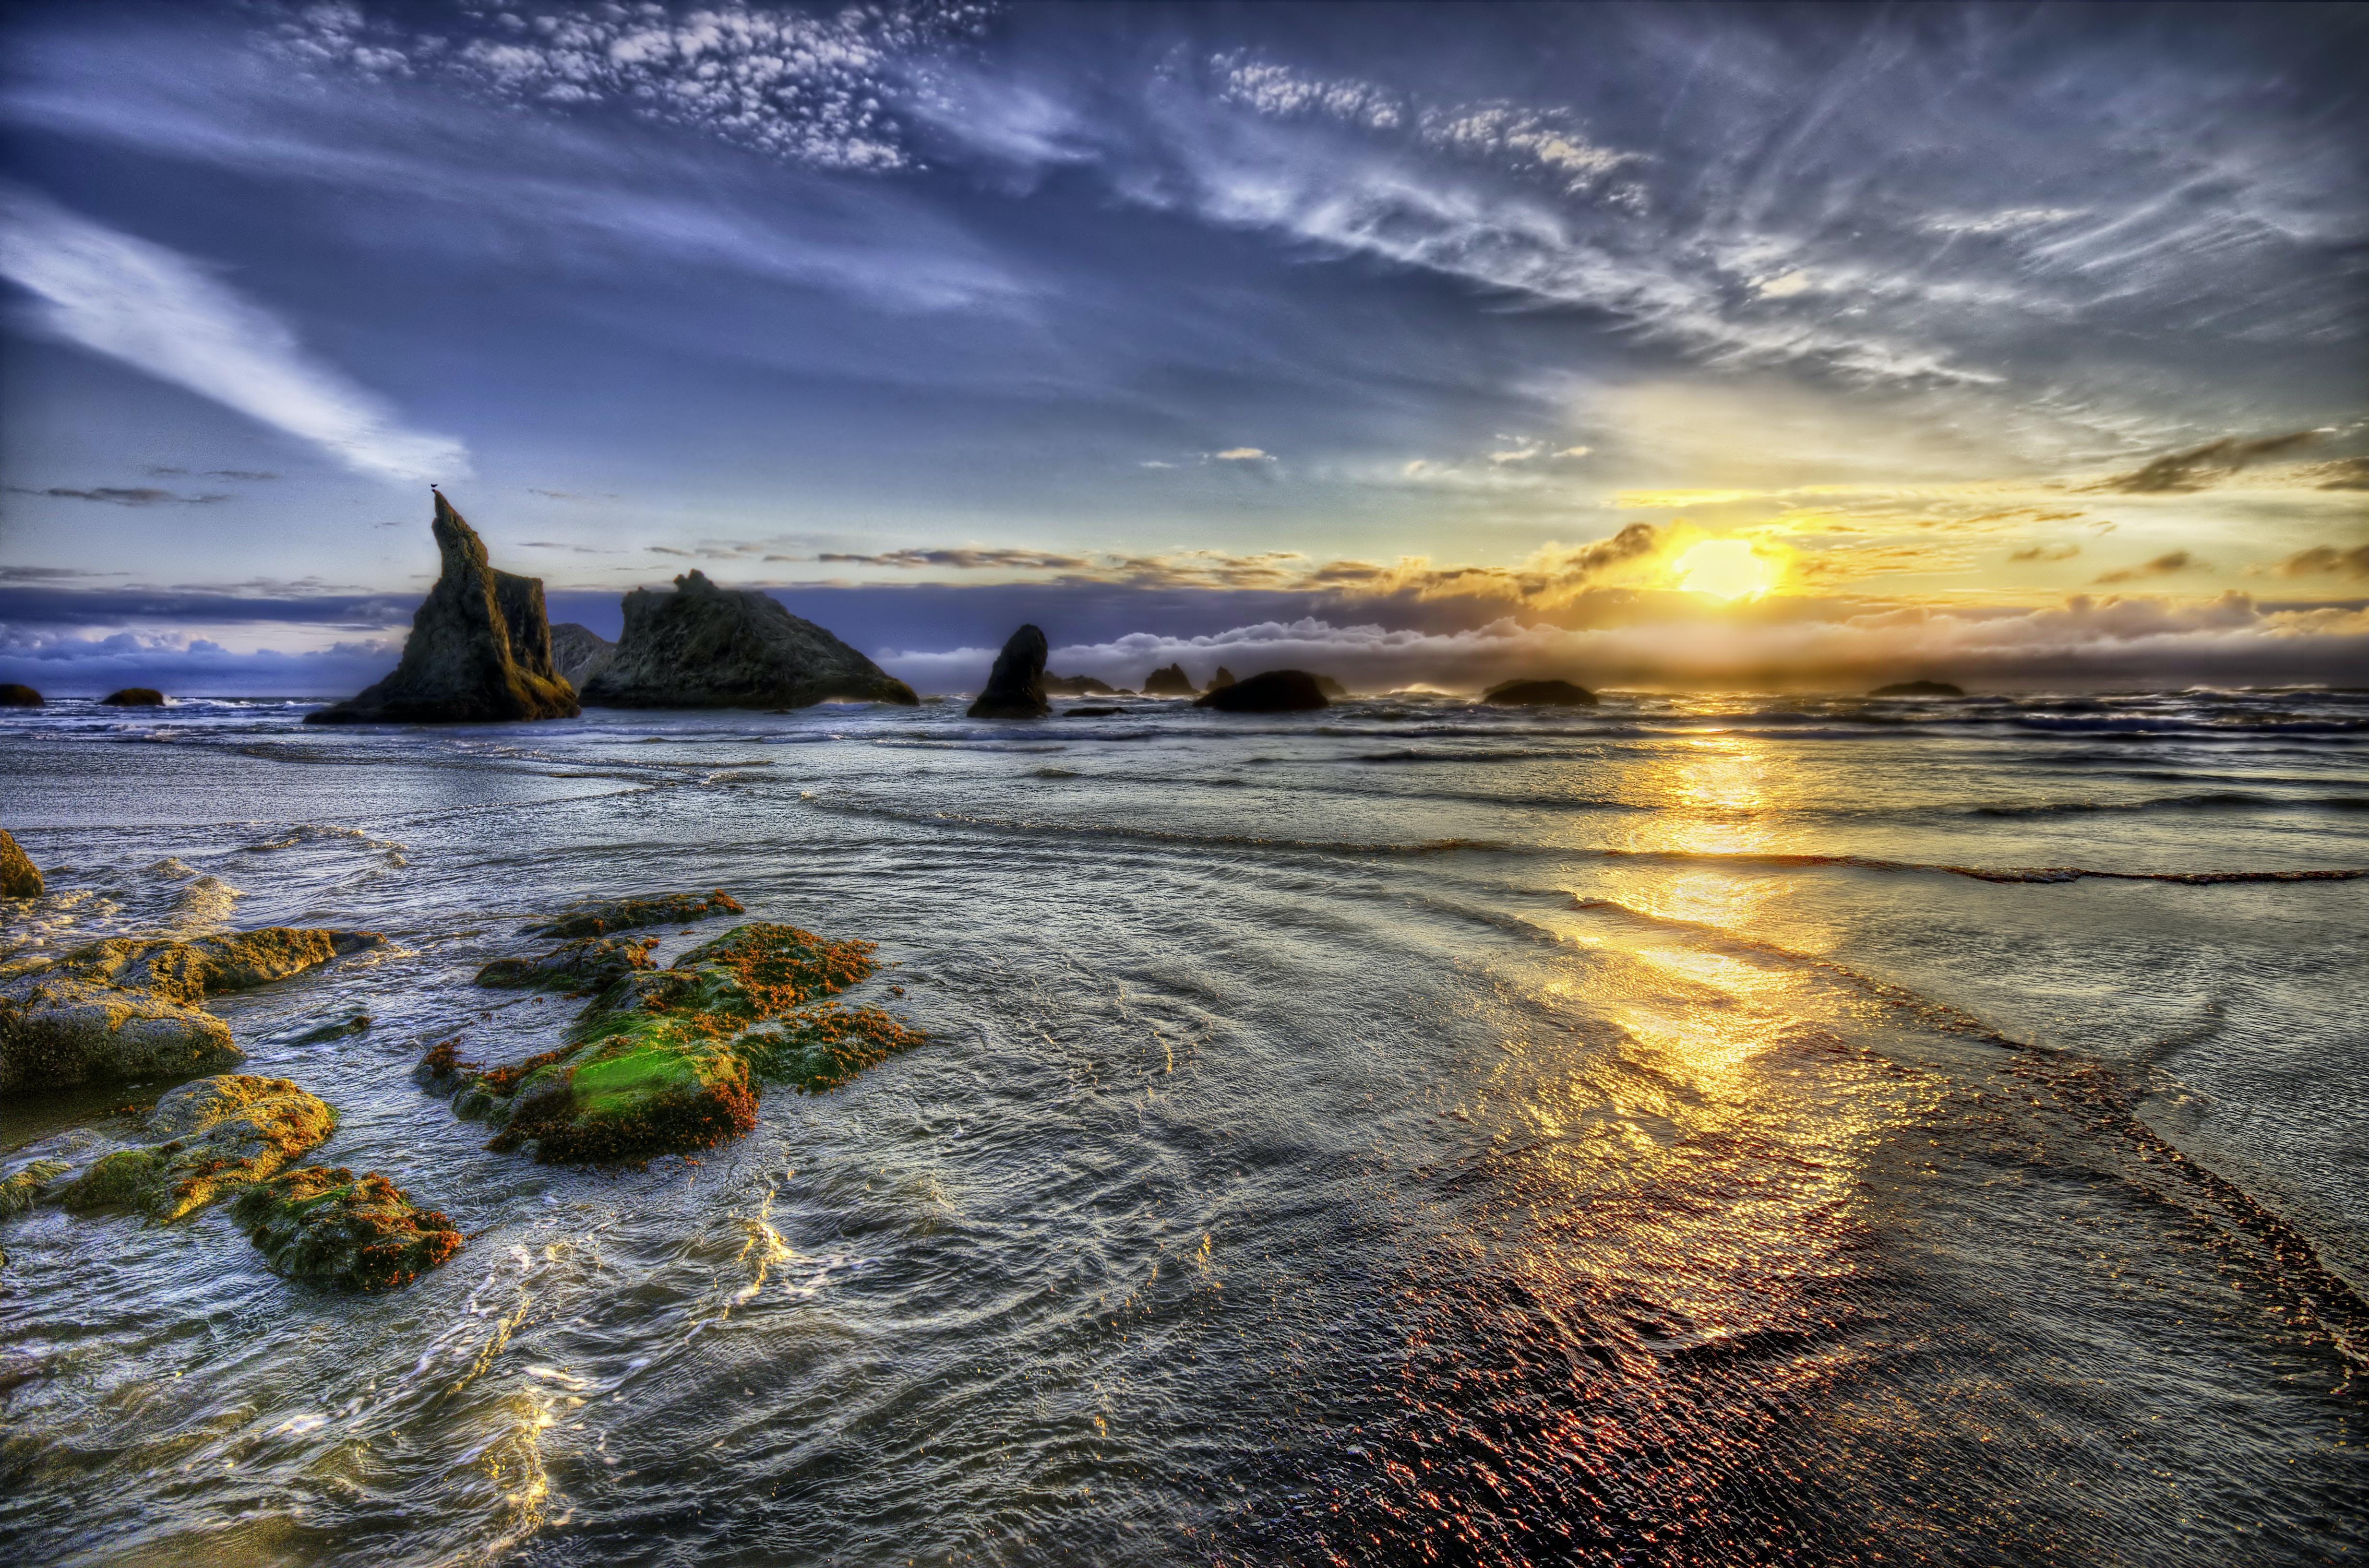 landscape photo of ocean during golden hour